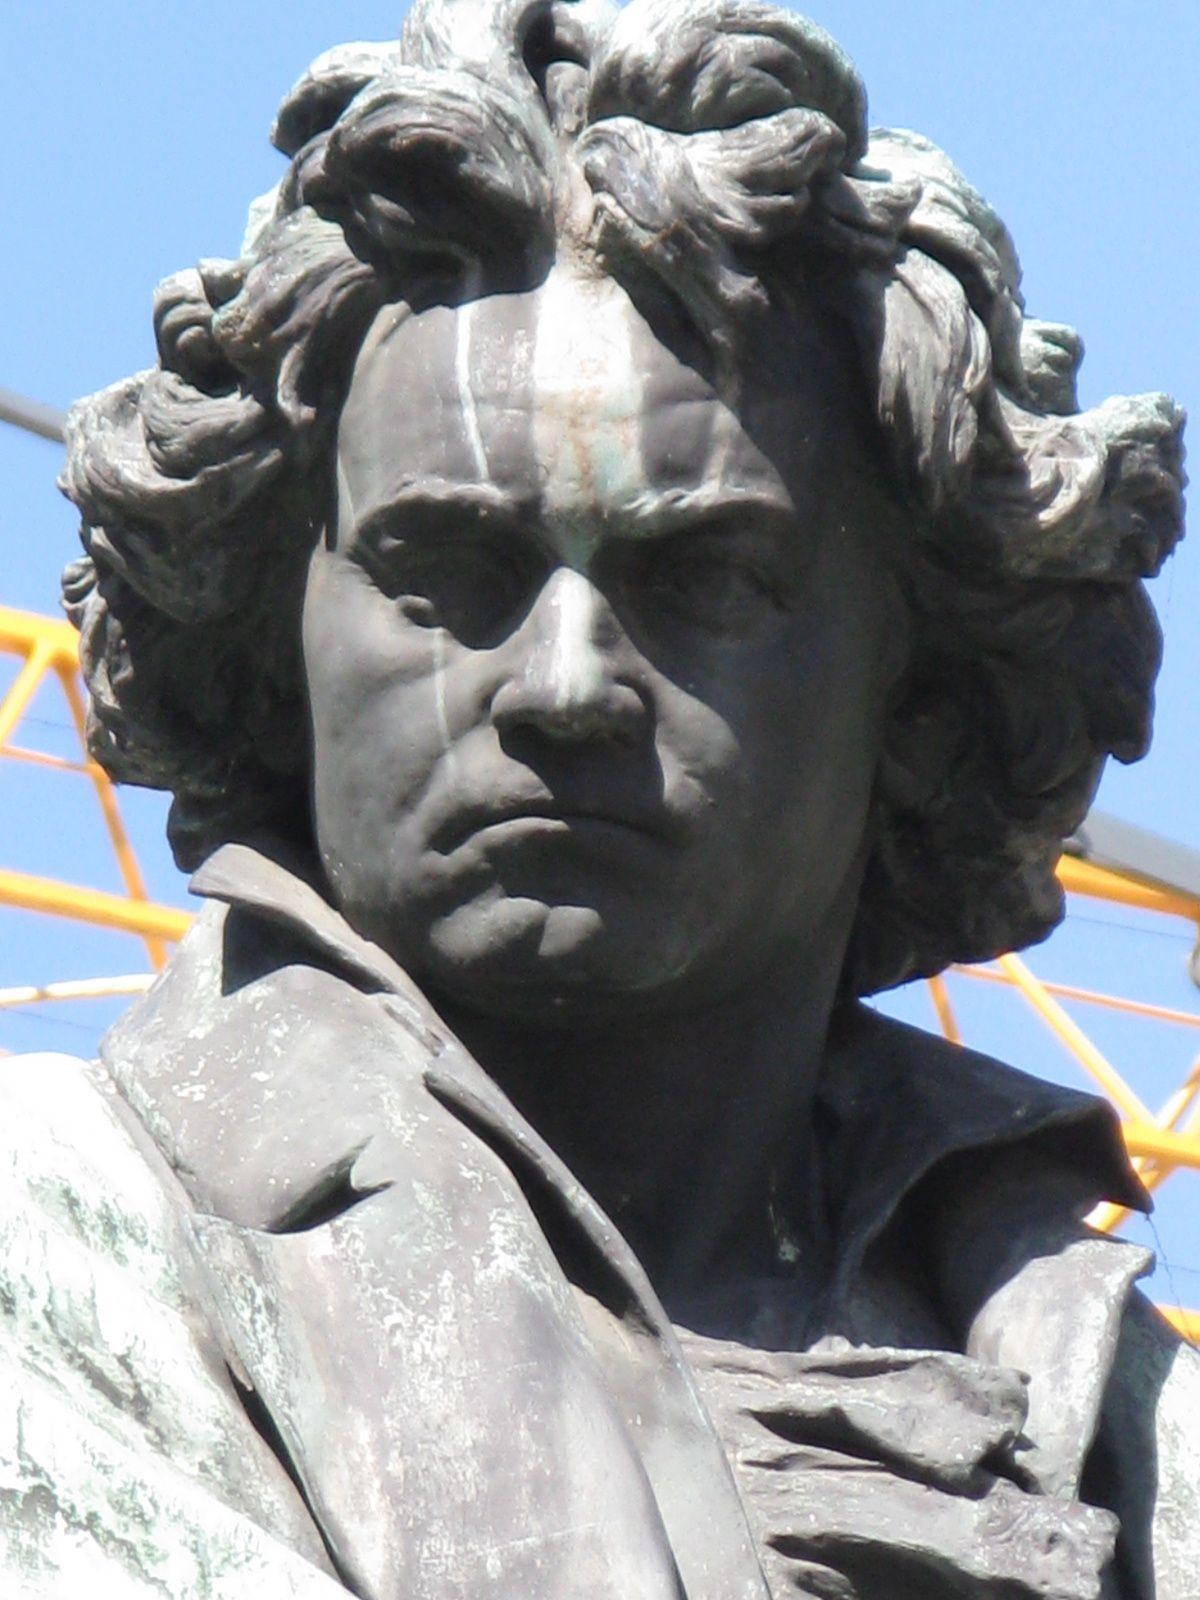 Ludwig van Beethoven par Kaspar von Zumbusch sur la Beethovenplatz à Vienne (Wien)